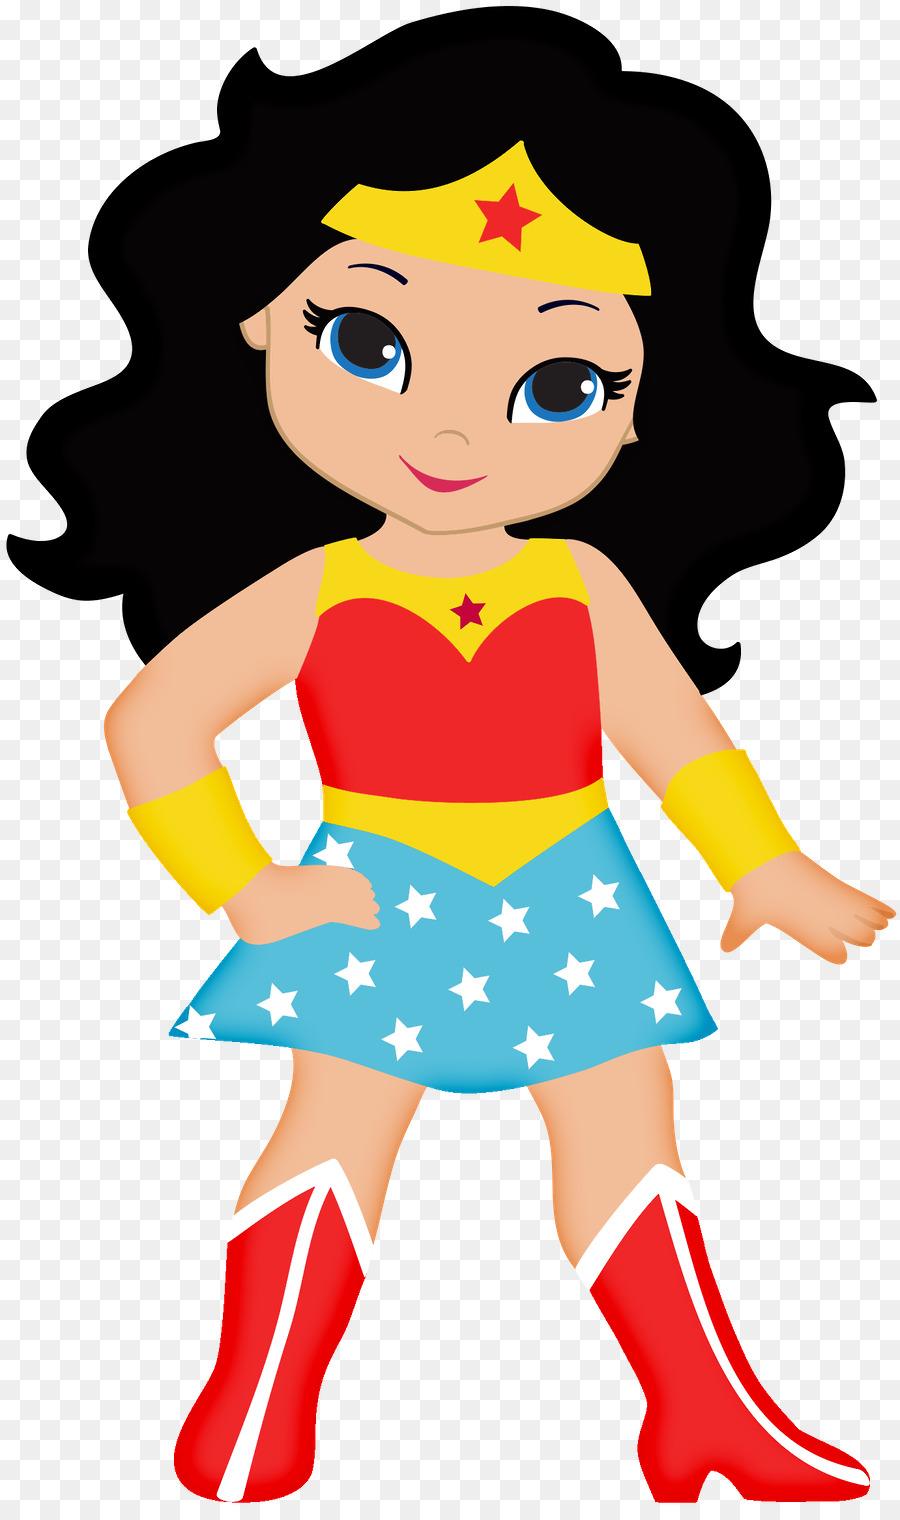 diana prince superman batman superwoman clip art women achievement rh kisspng com superman clip art free superman clip art free